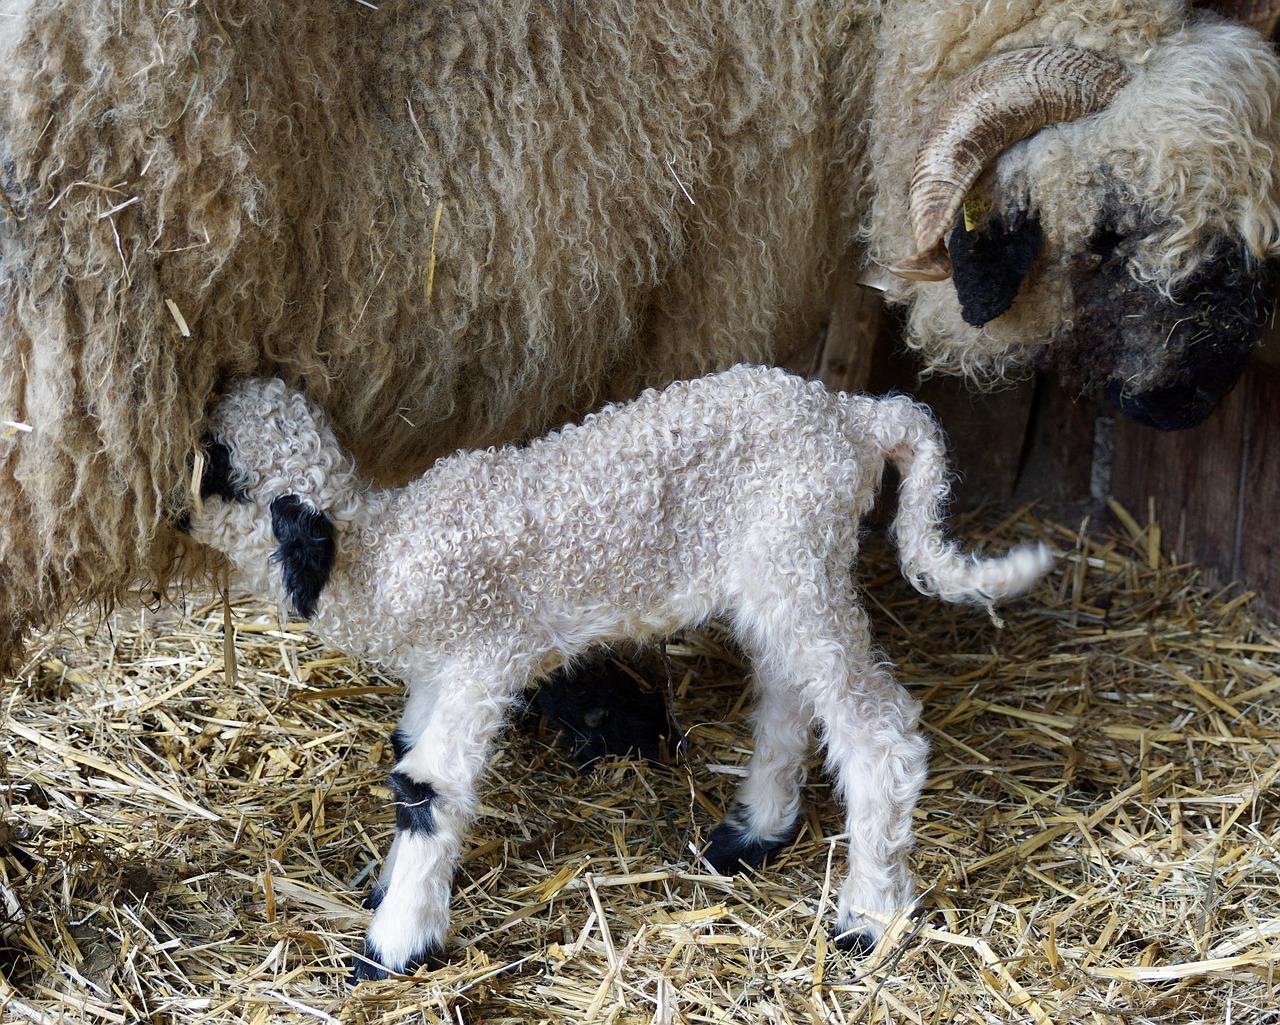 New born lamb suckling